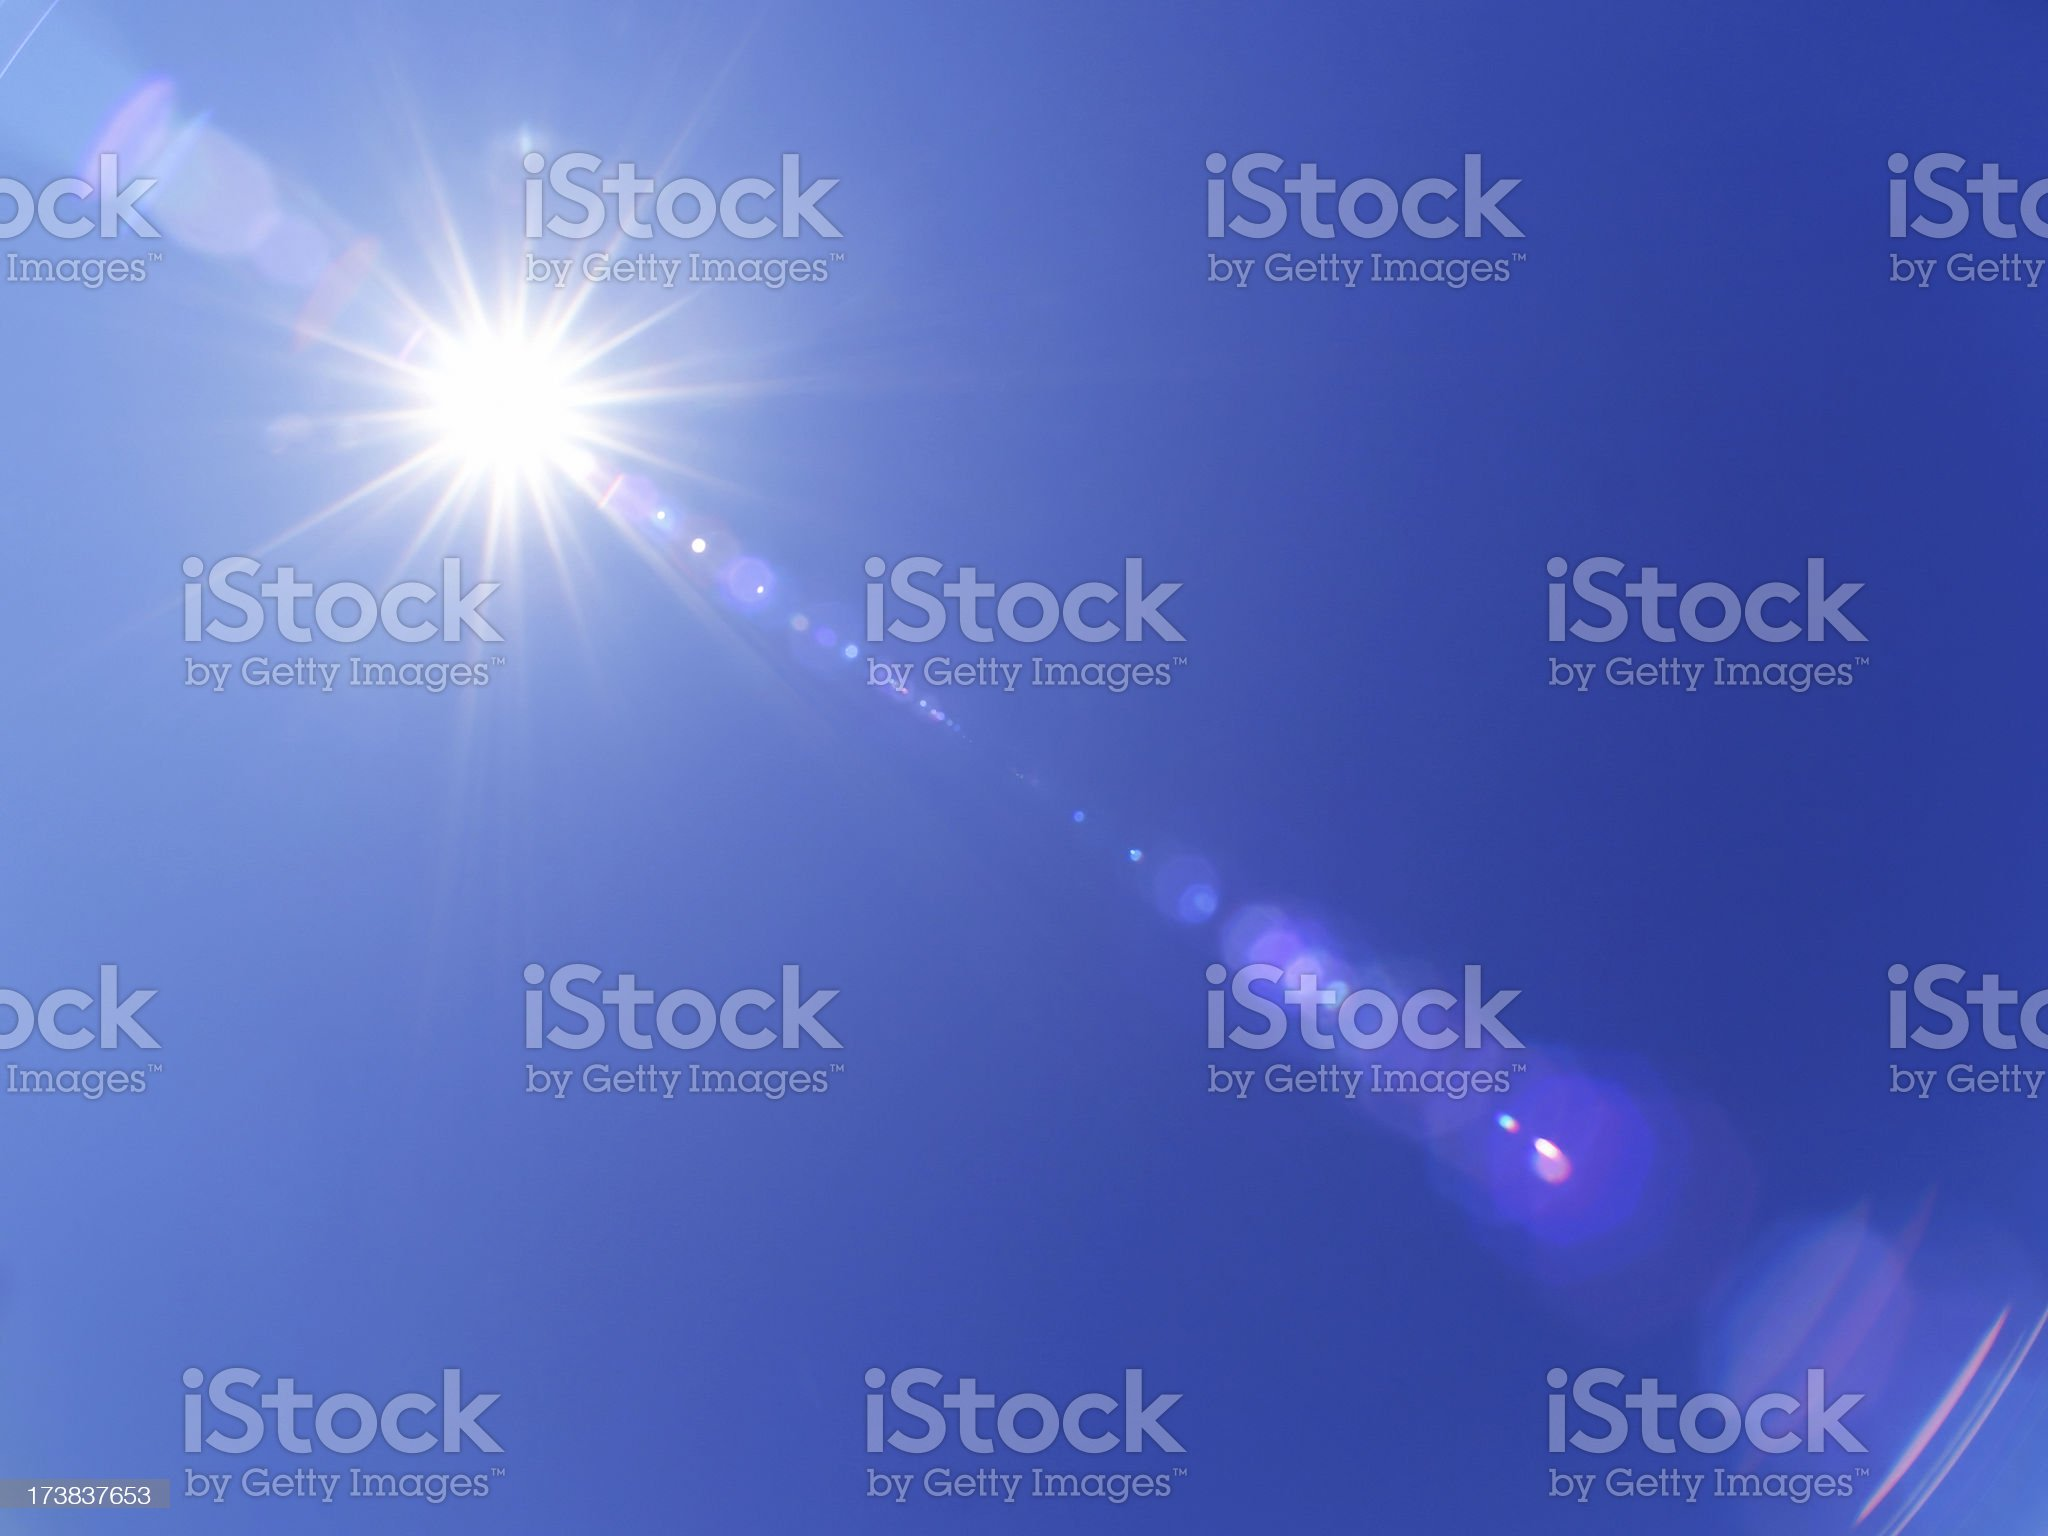 Real lensflare royalty-free stock photo